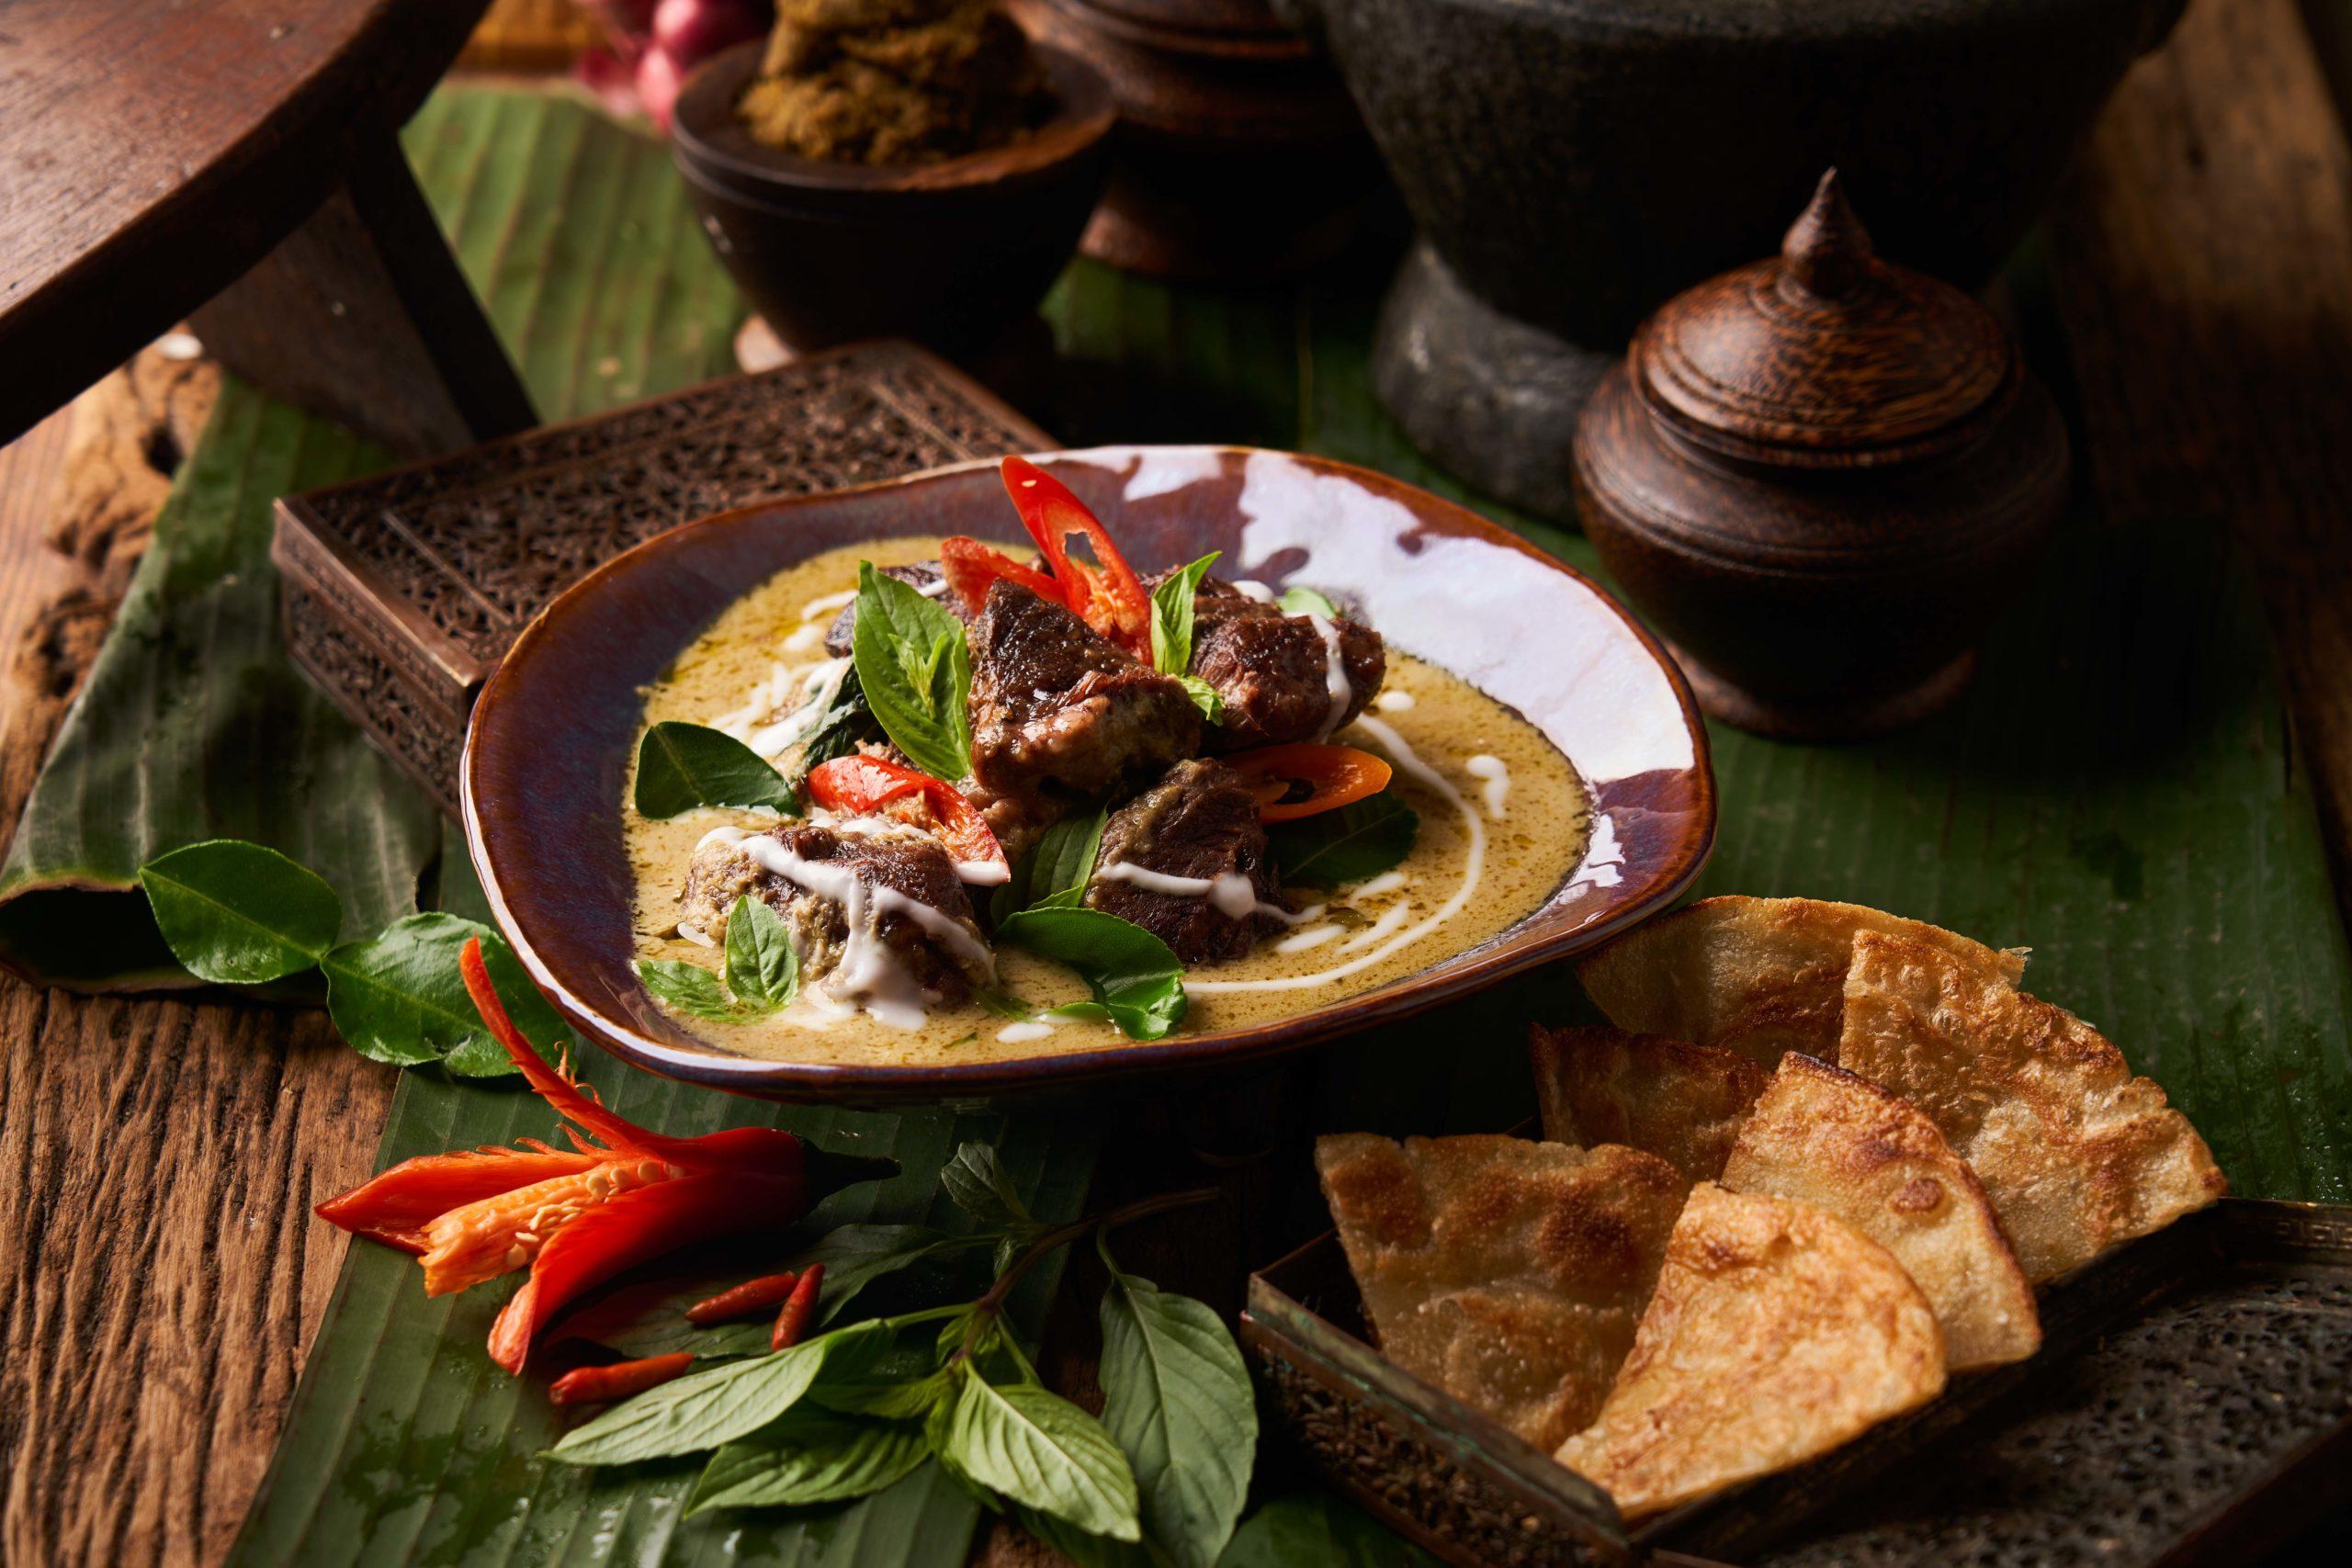 Anantara Siam, dining service, suite life